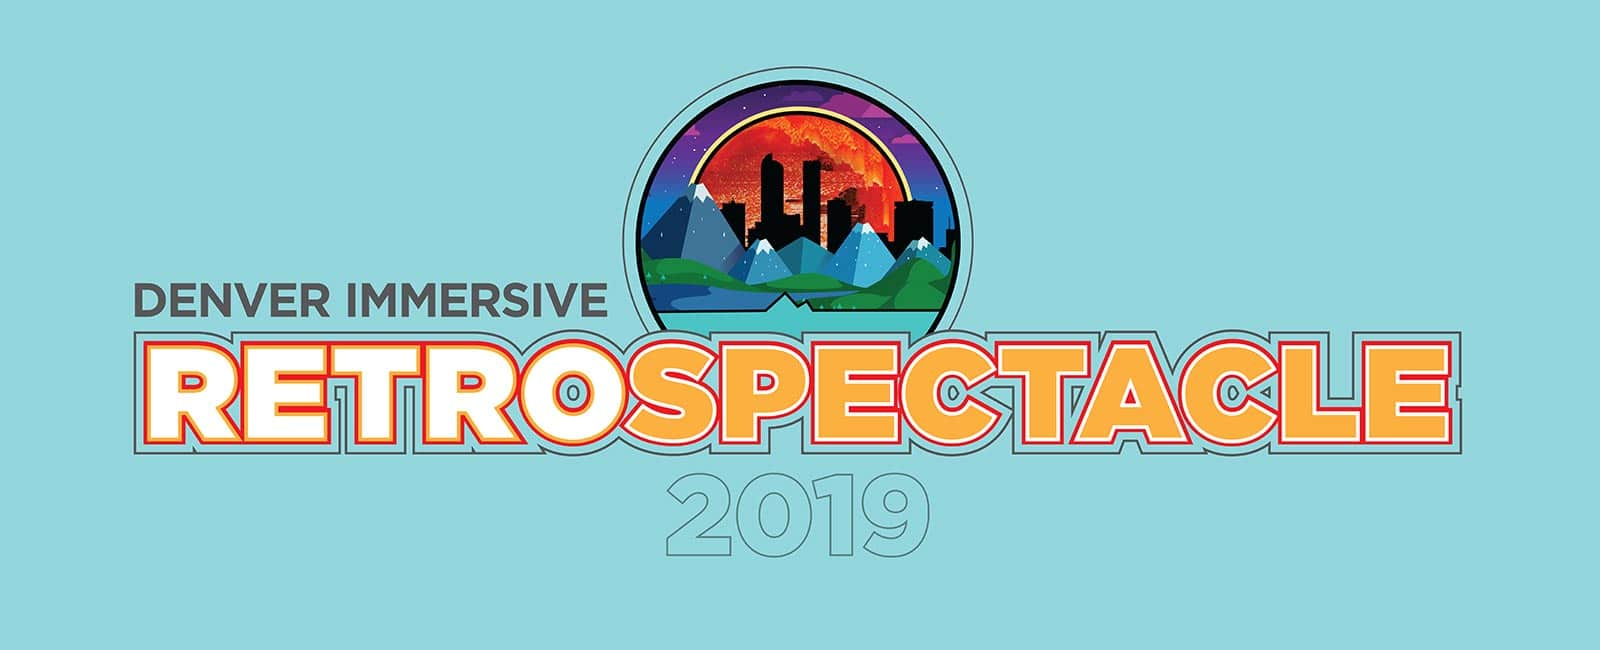 Denver Immersive Retrospectacle 2019